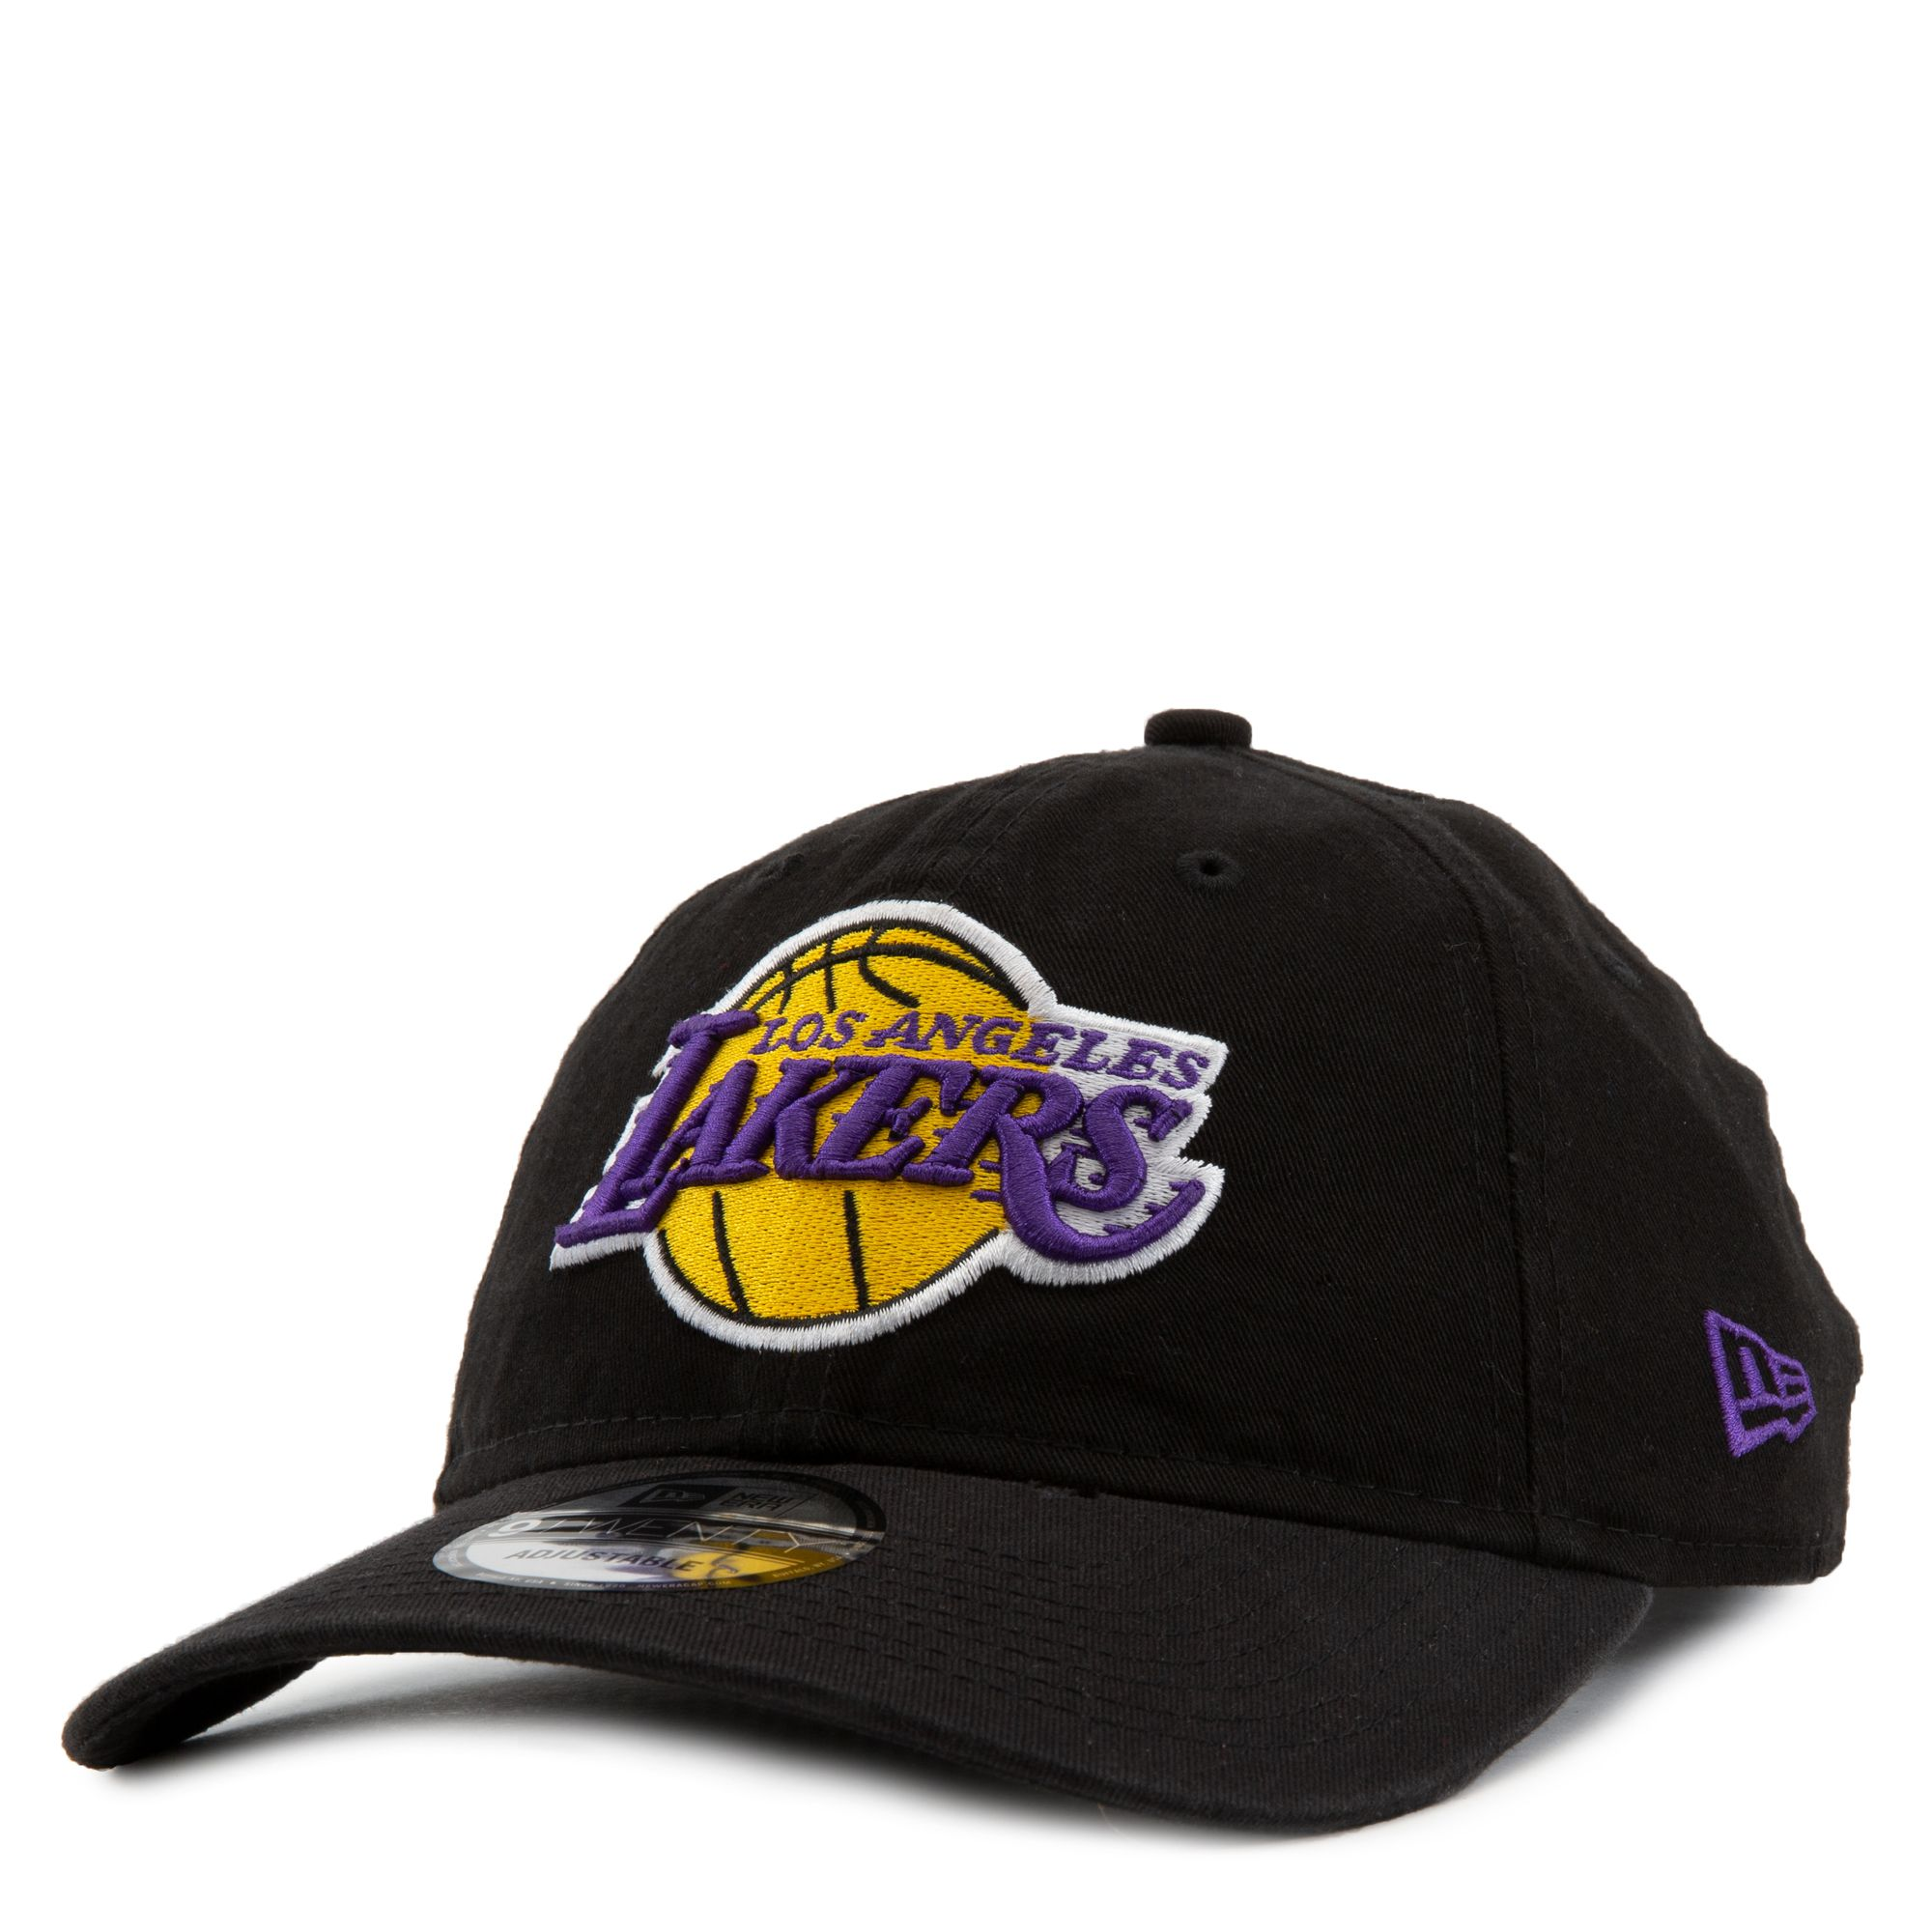 Los Angeles Lakers Core Classic 9twenty Hat Black Gold Purple